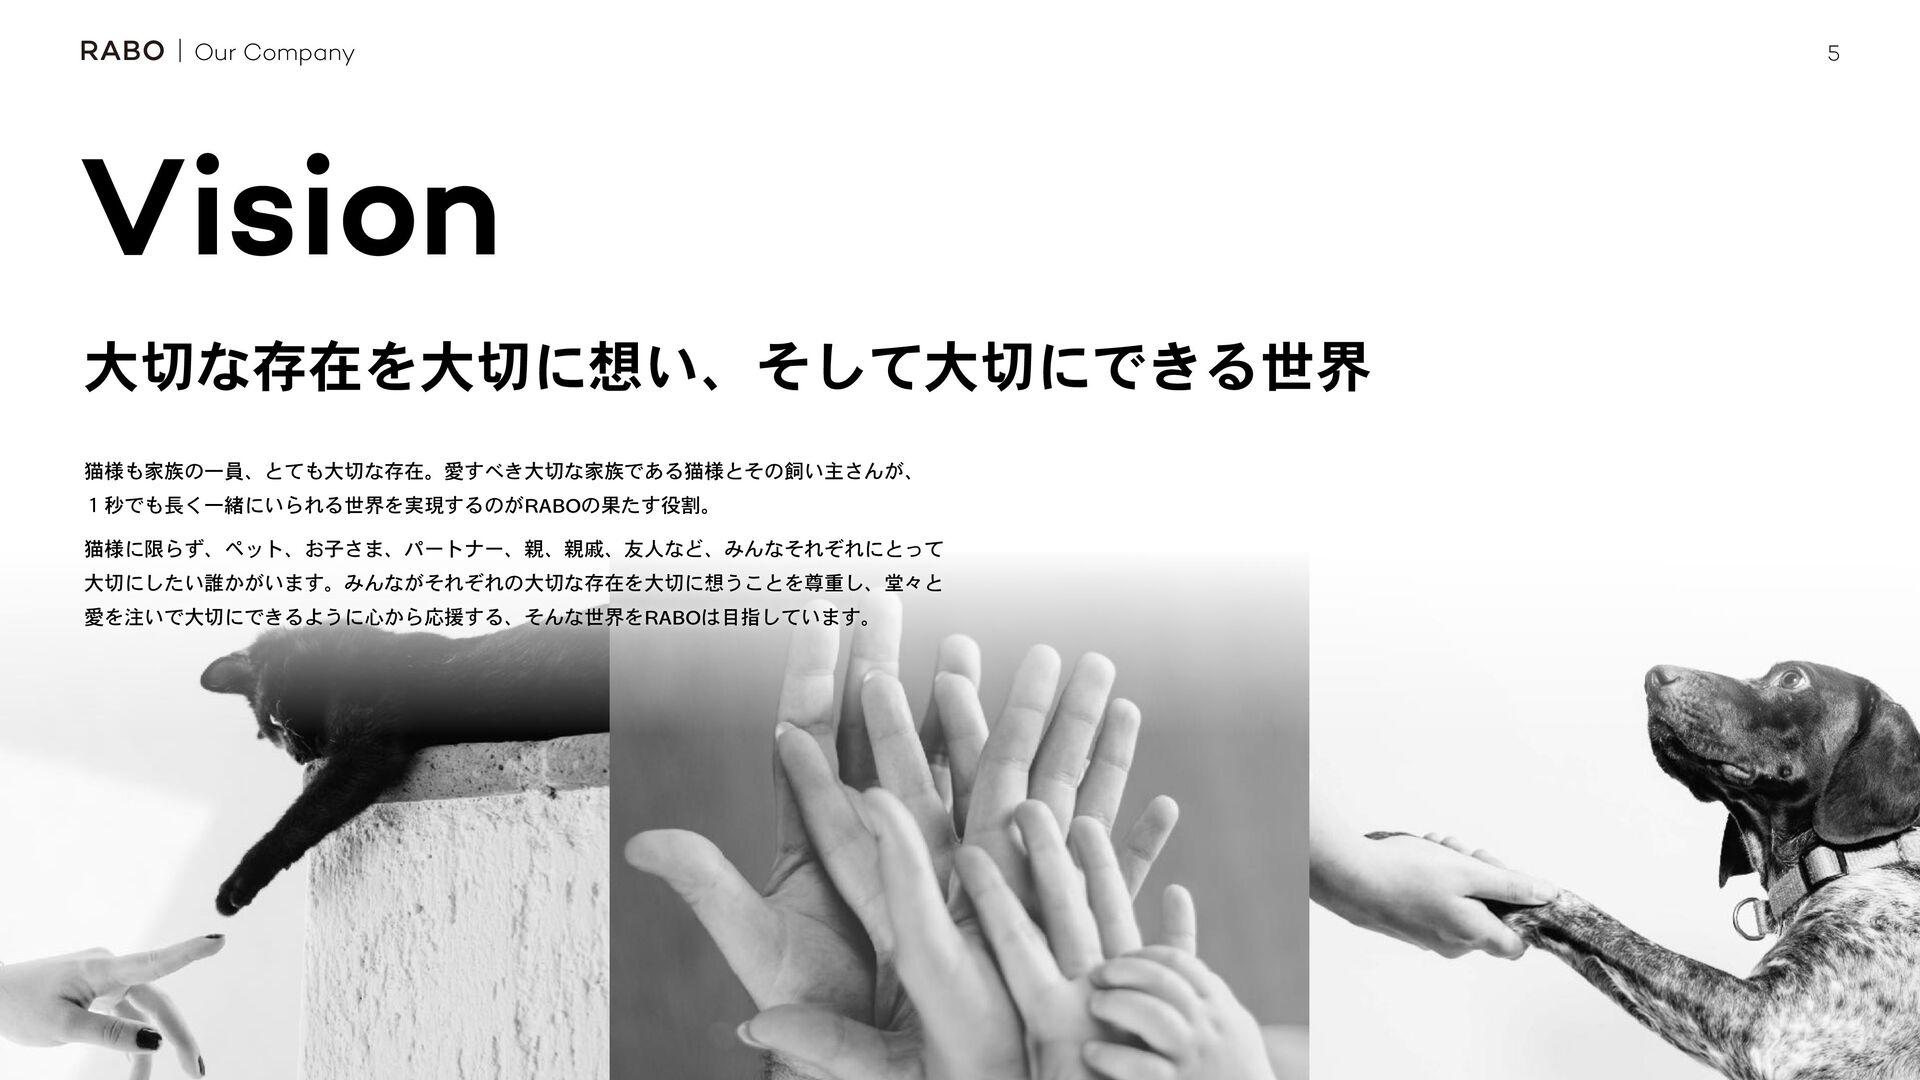 5 Our Company େͳଘࡏΛେʹ͍ɺͦͯ͠େʹͰ͖Δੈք ೣ༷ՈͷҰһɺ...